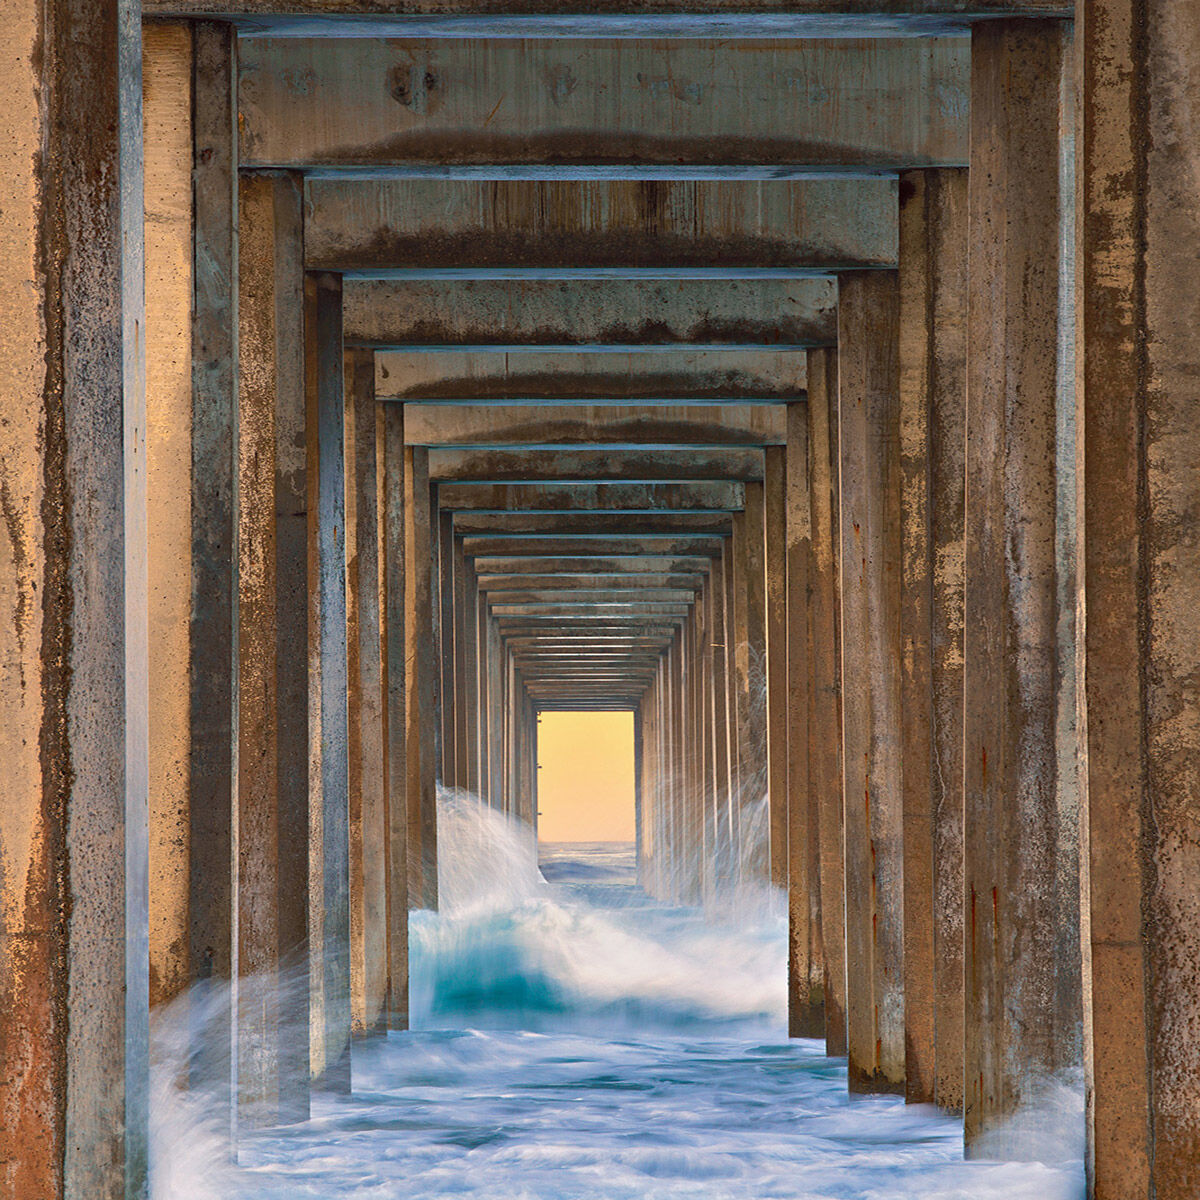 A fine art photograph of crashing waves under the Scripps Pier in La Jolla, California titled Ebb & Flow.